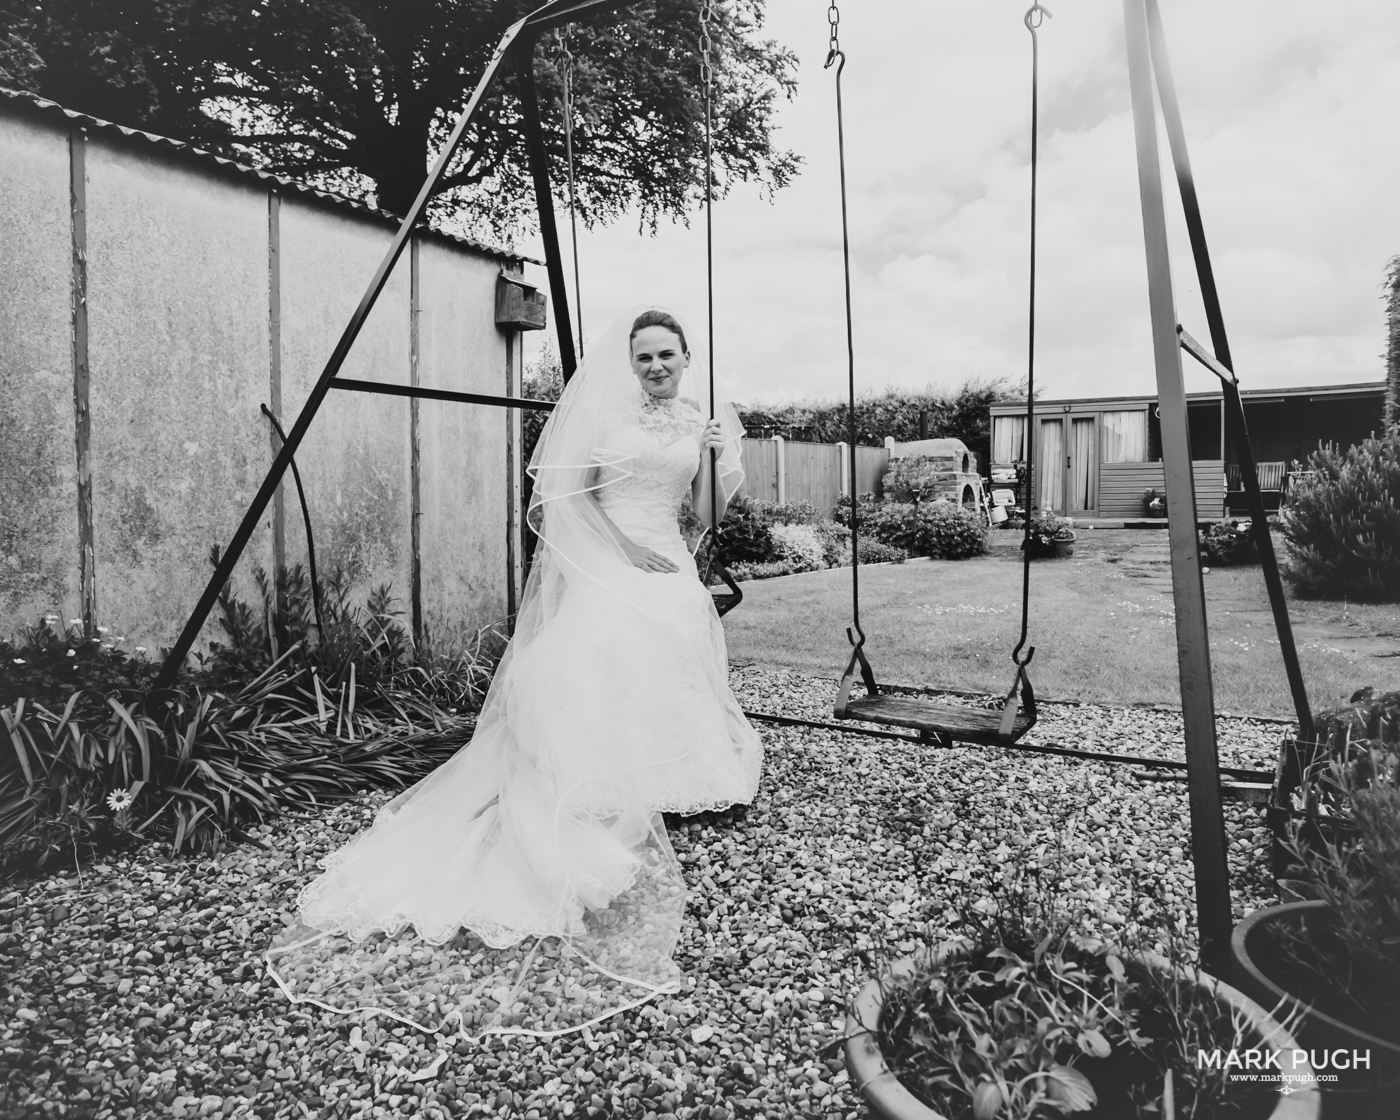 051- Laura and Peter - Wollaton Hall Wedding Nottingham UK by Mark Pugh www.markpugh.com.jpg